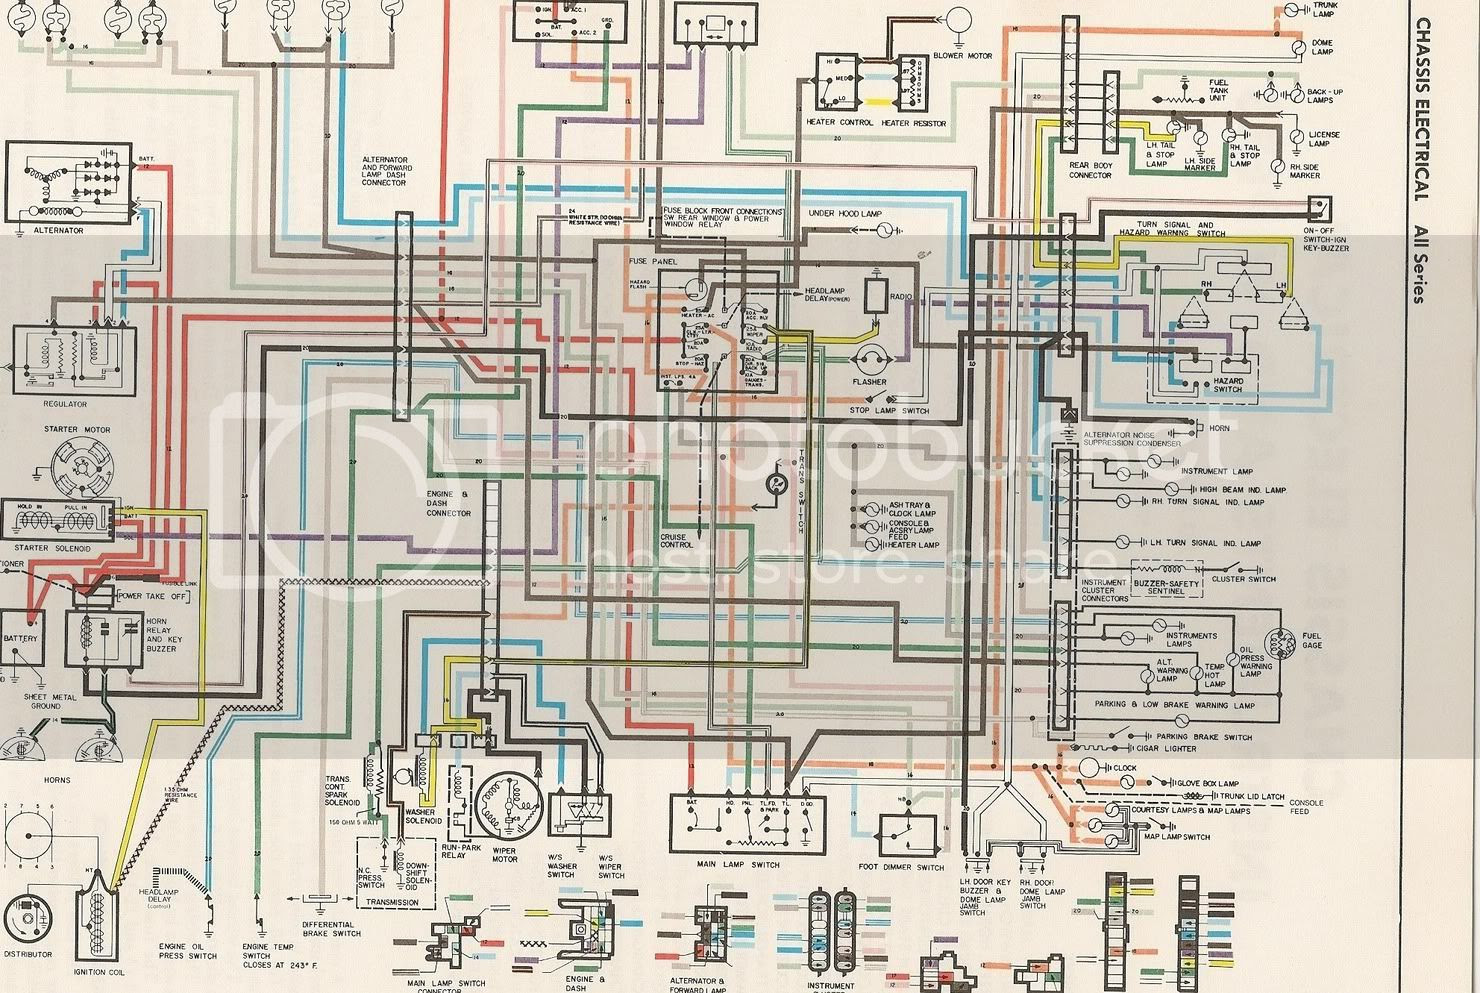 Diagram Oldsmobile 442 Wiring Diagram Full Version Hd Quality Wiring Diagram Musicwiring Intoparadiso It